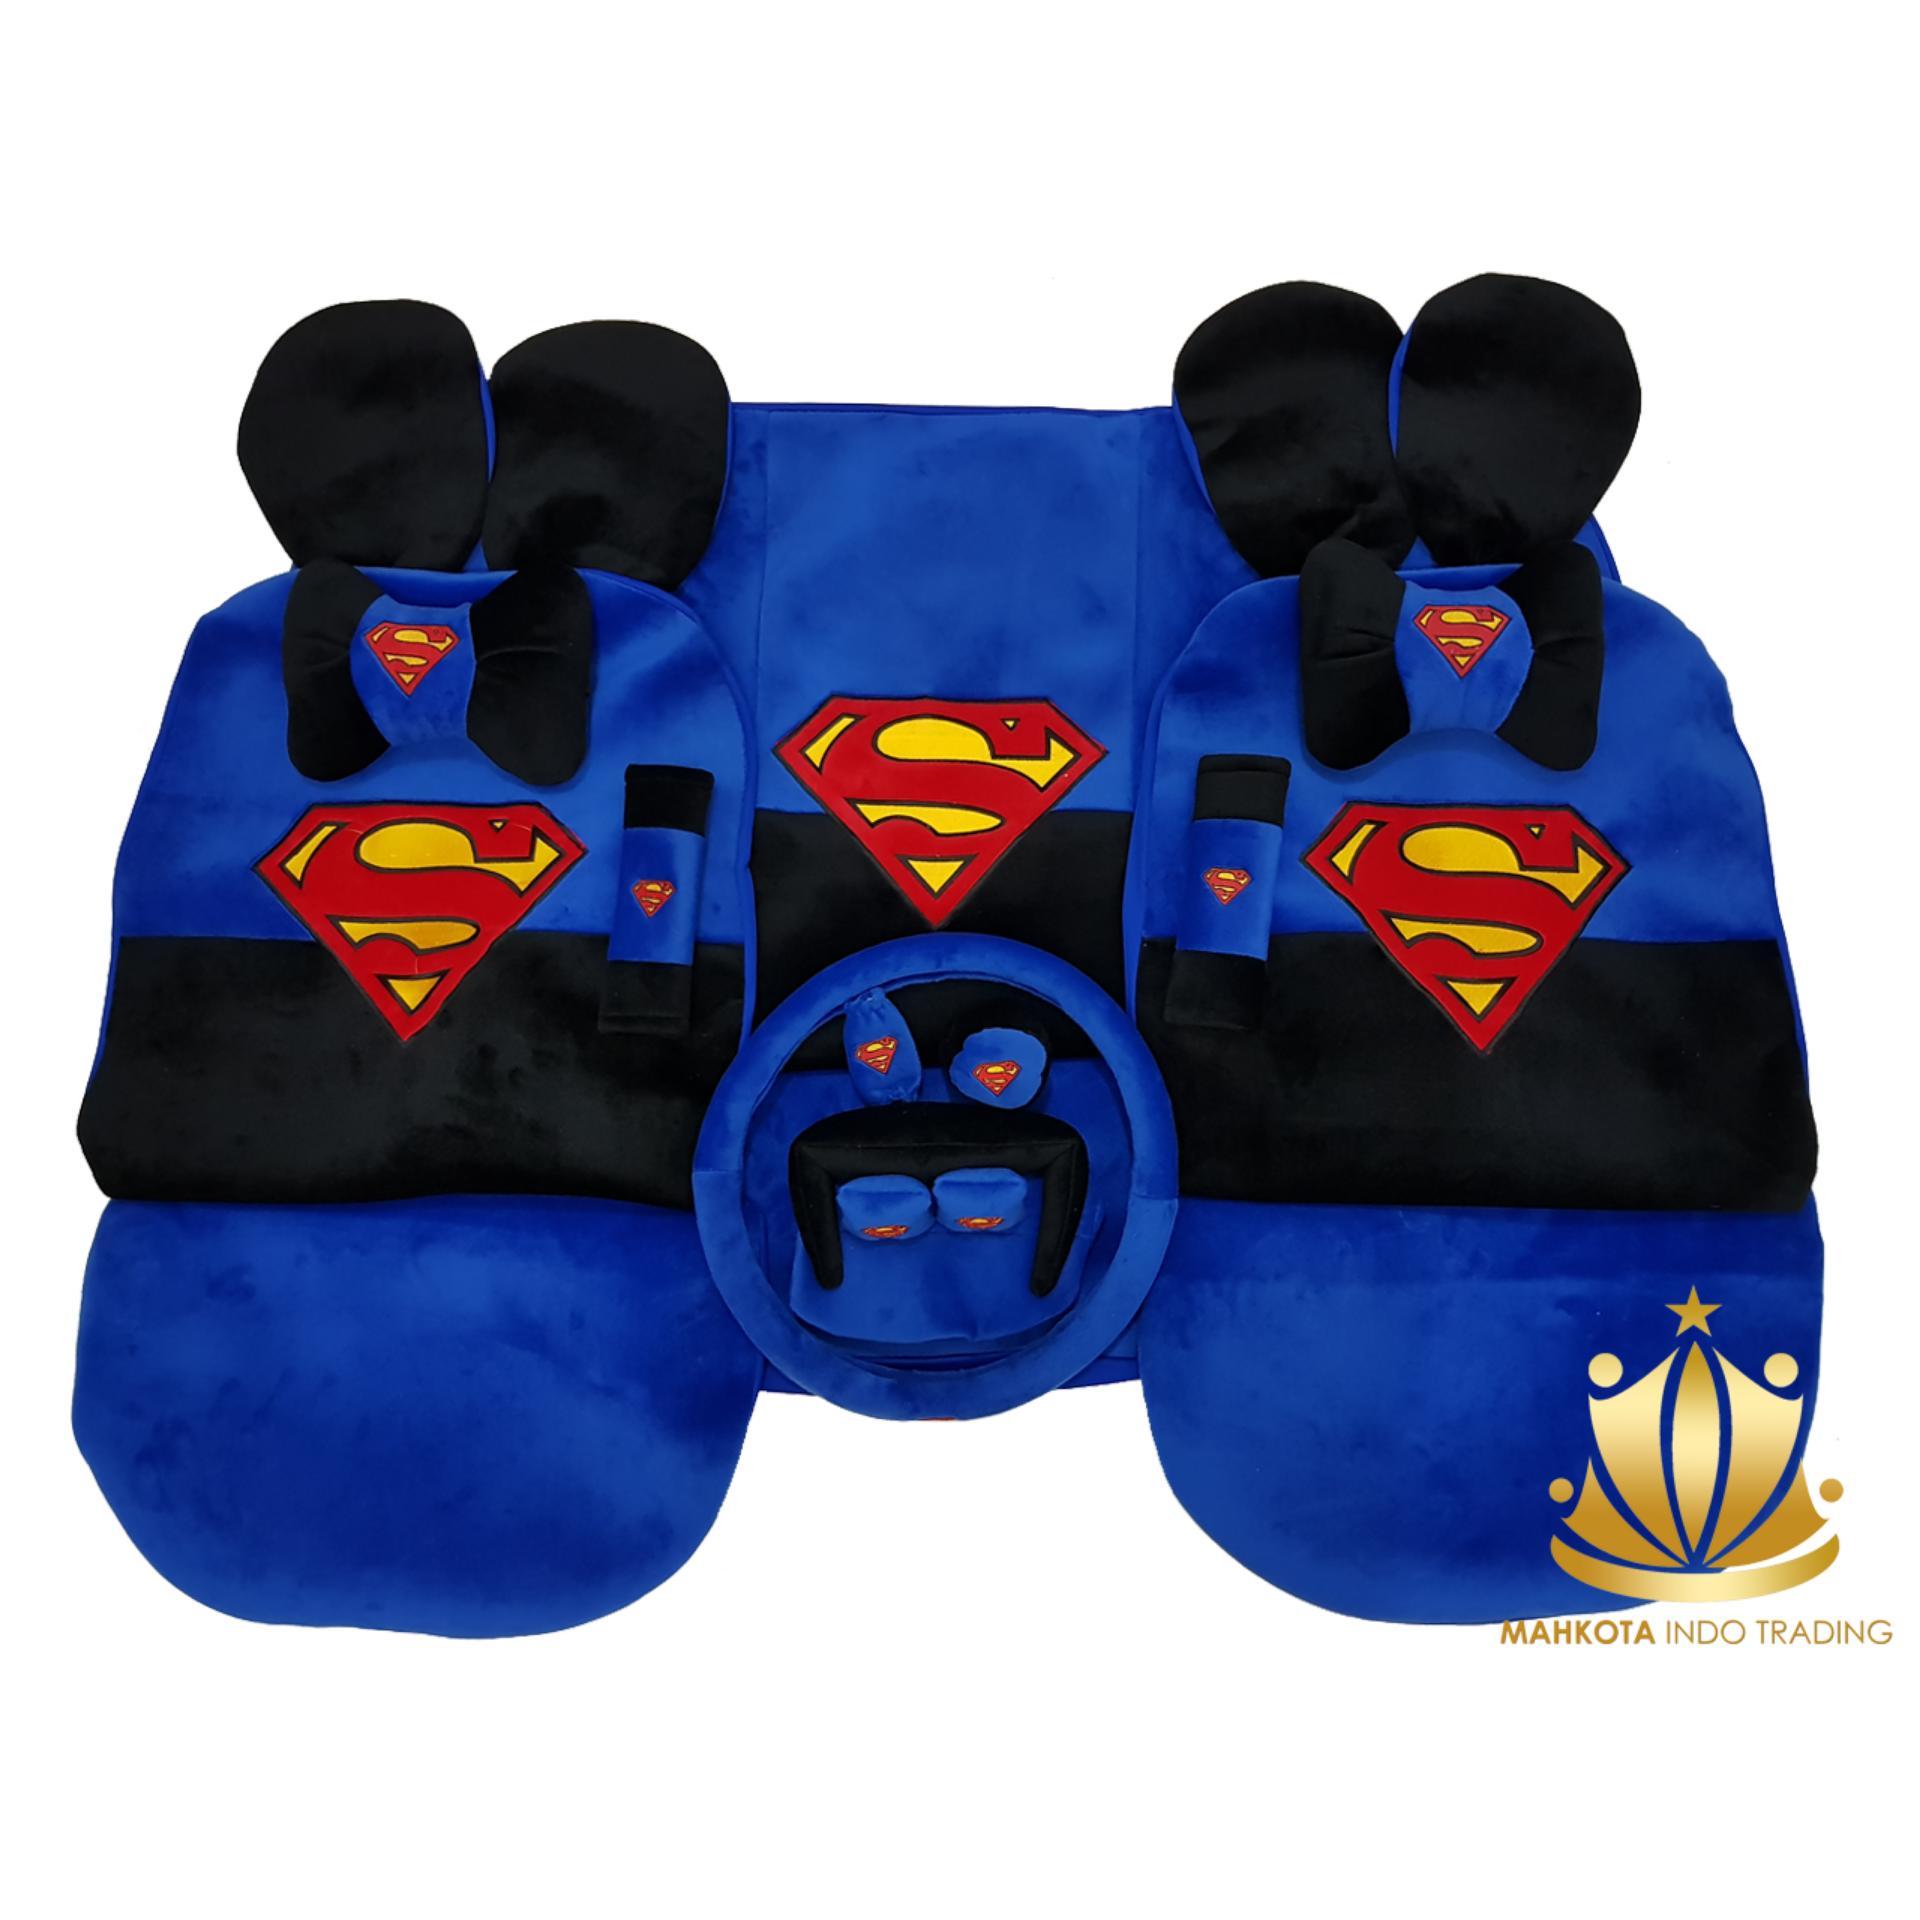 Sarung Jok 24in1 / Car Set / Bantal Mobil Superman All New Avanza / All New Xenia (Head-rest Tidak Menyatu) (3 Baris)